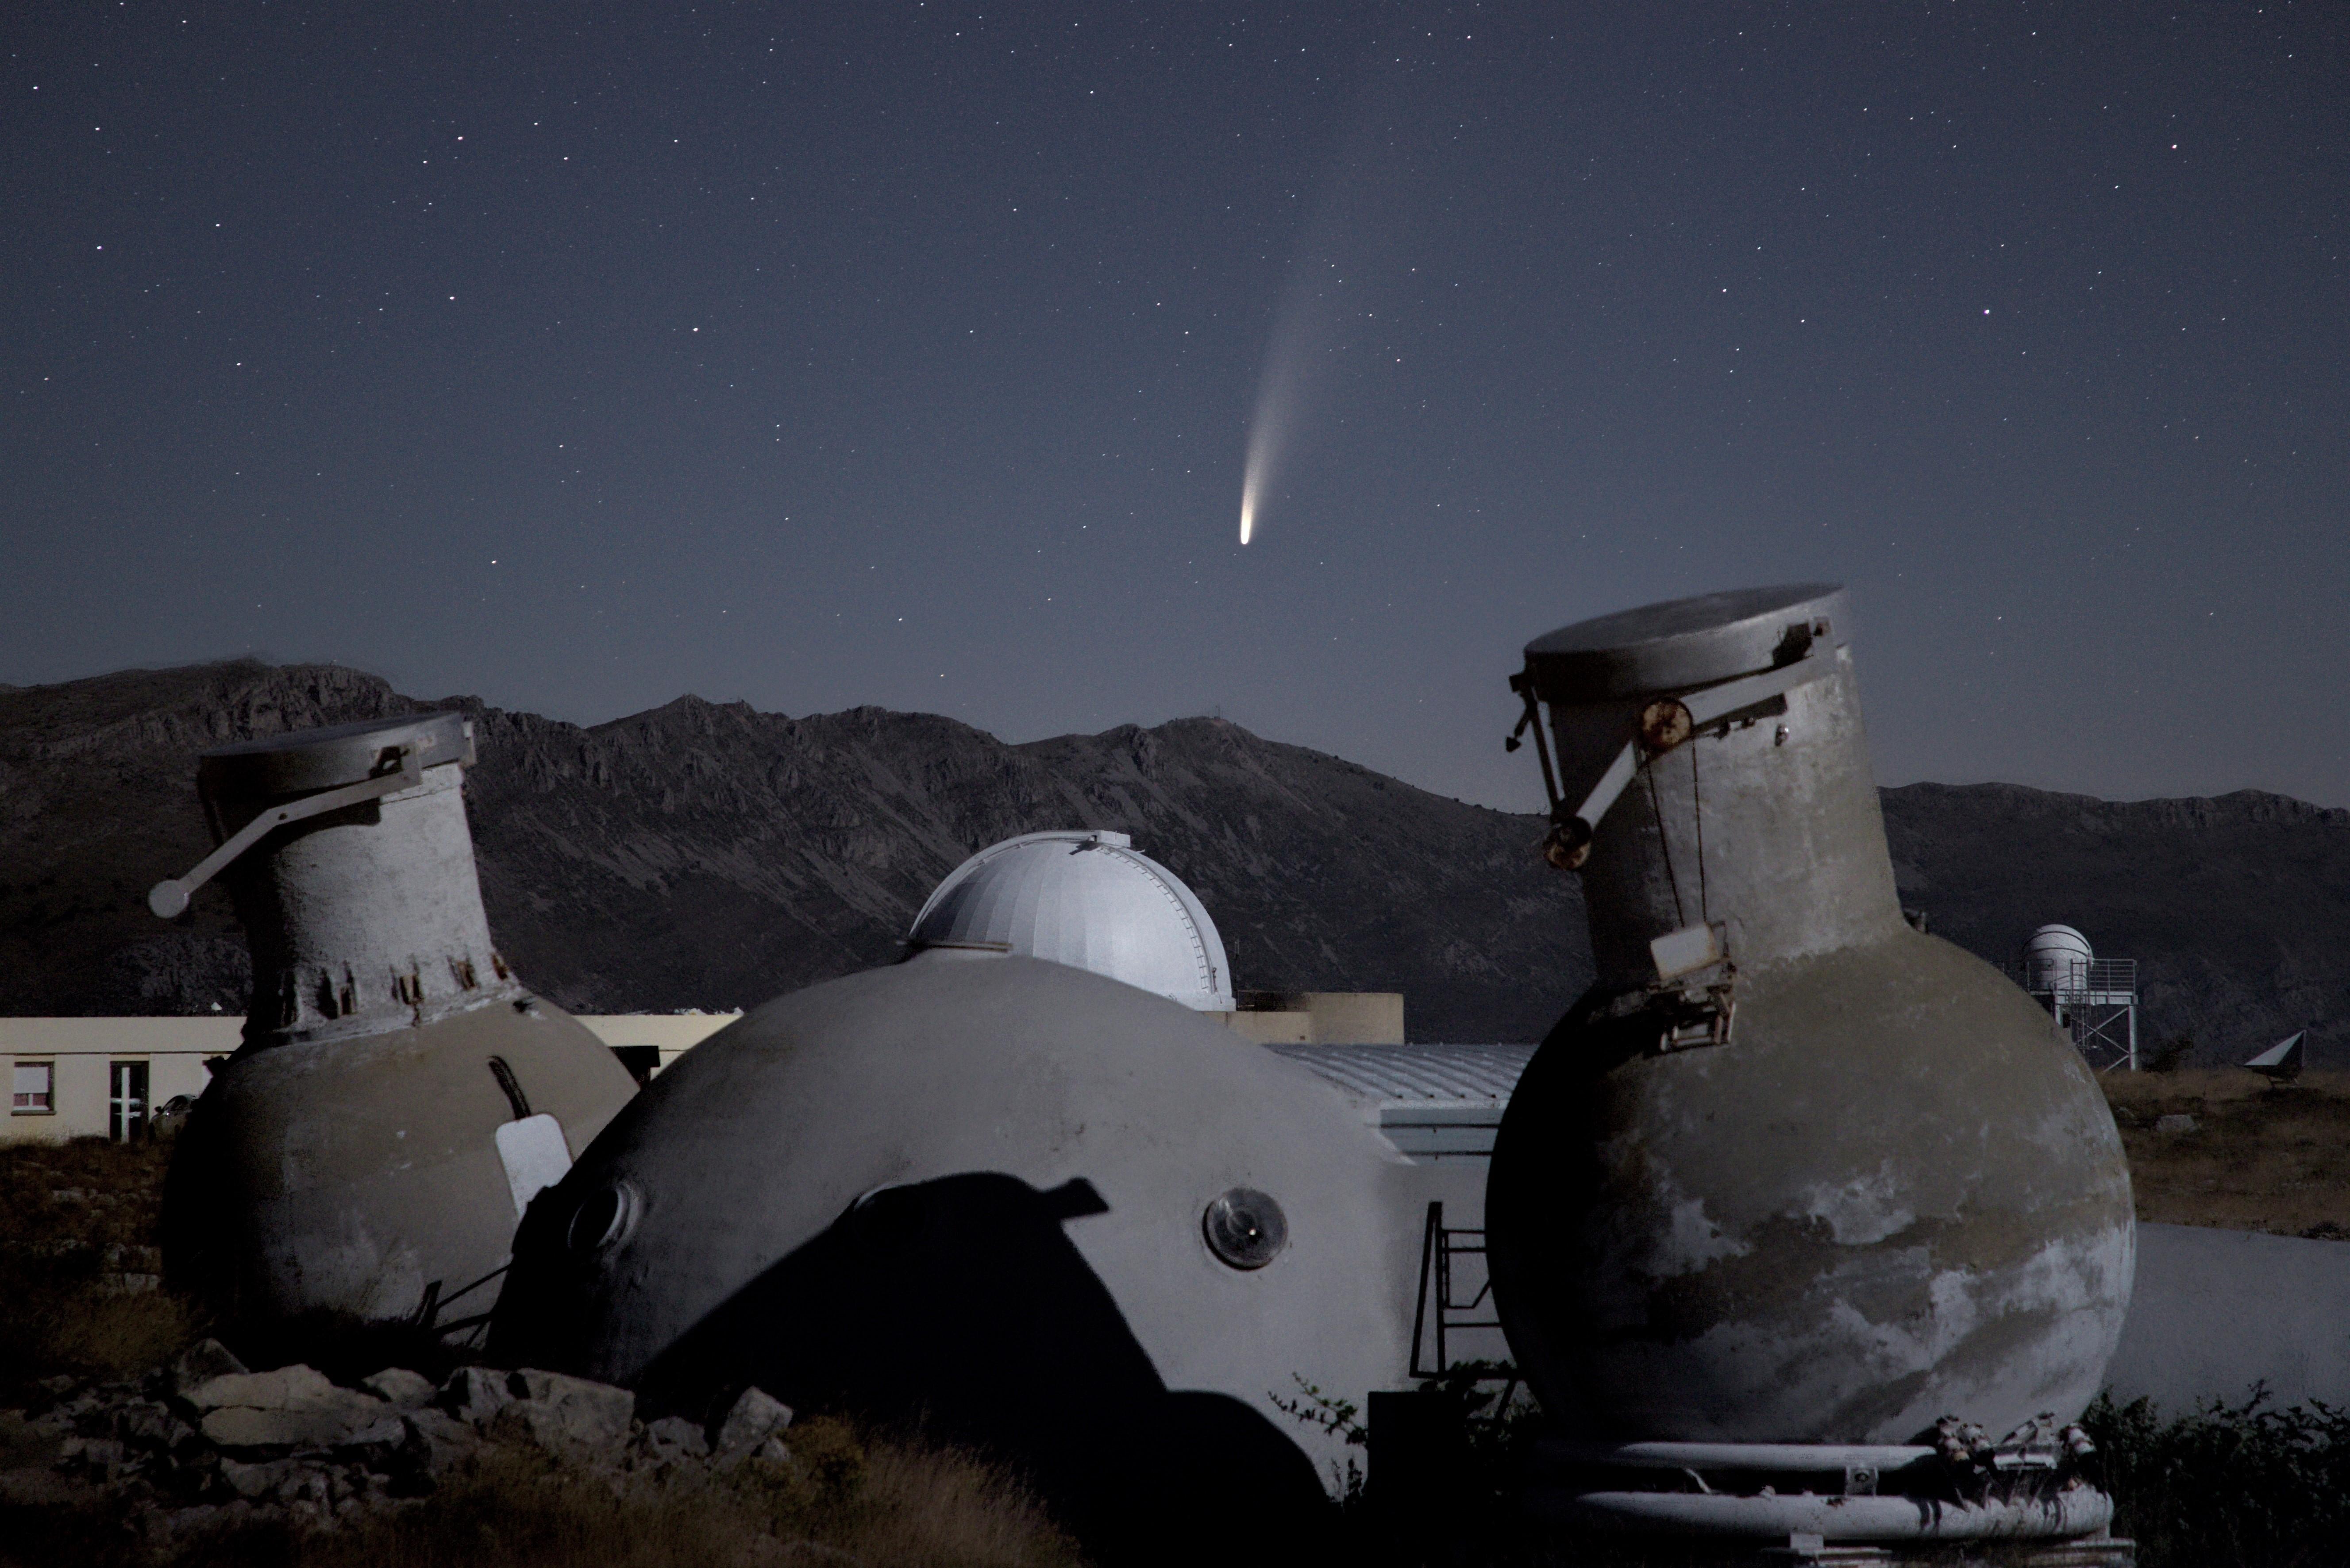 15 - COMETE NEOWISE